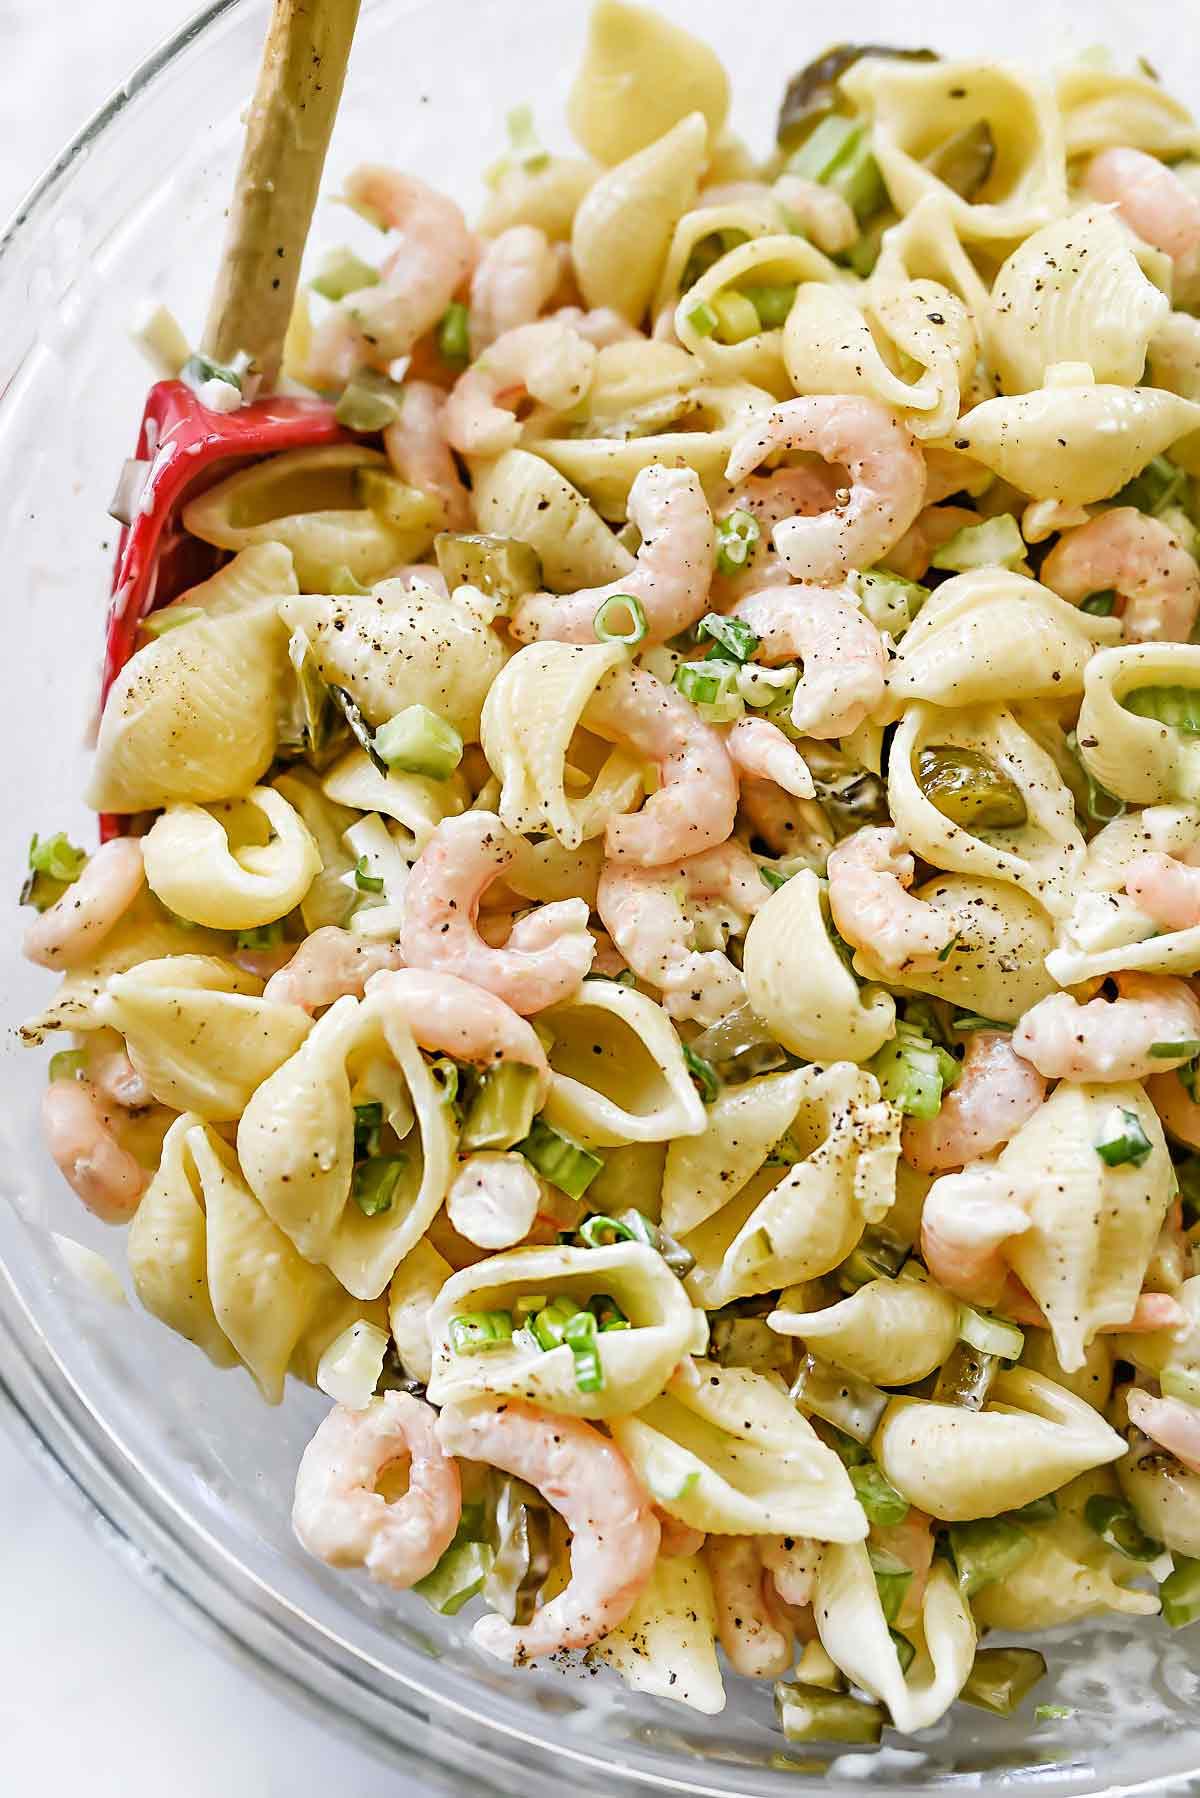 Shrimp And Pasta Salad  Shrimp and Macaroni Salad Recipe